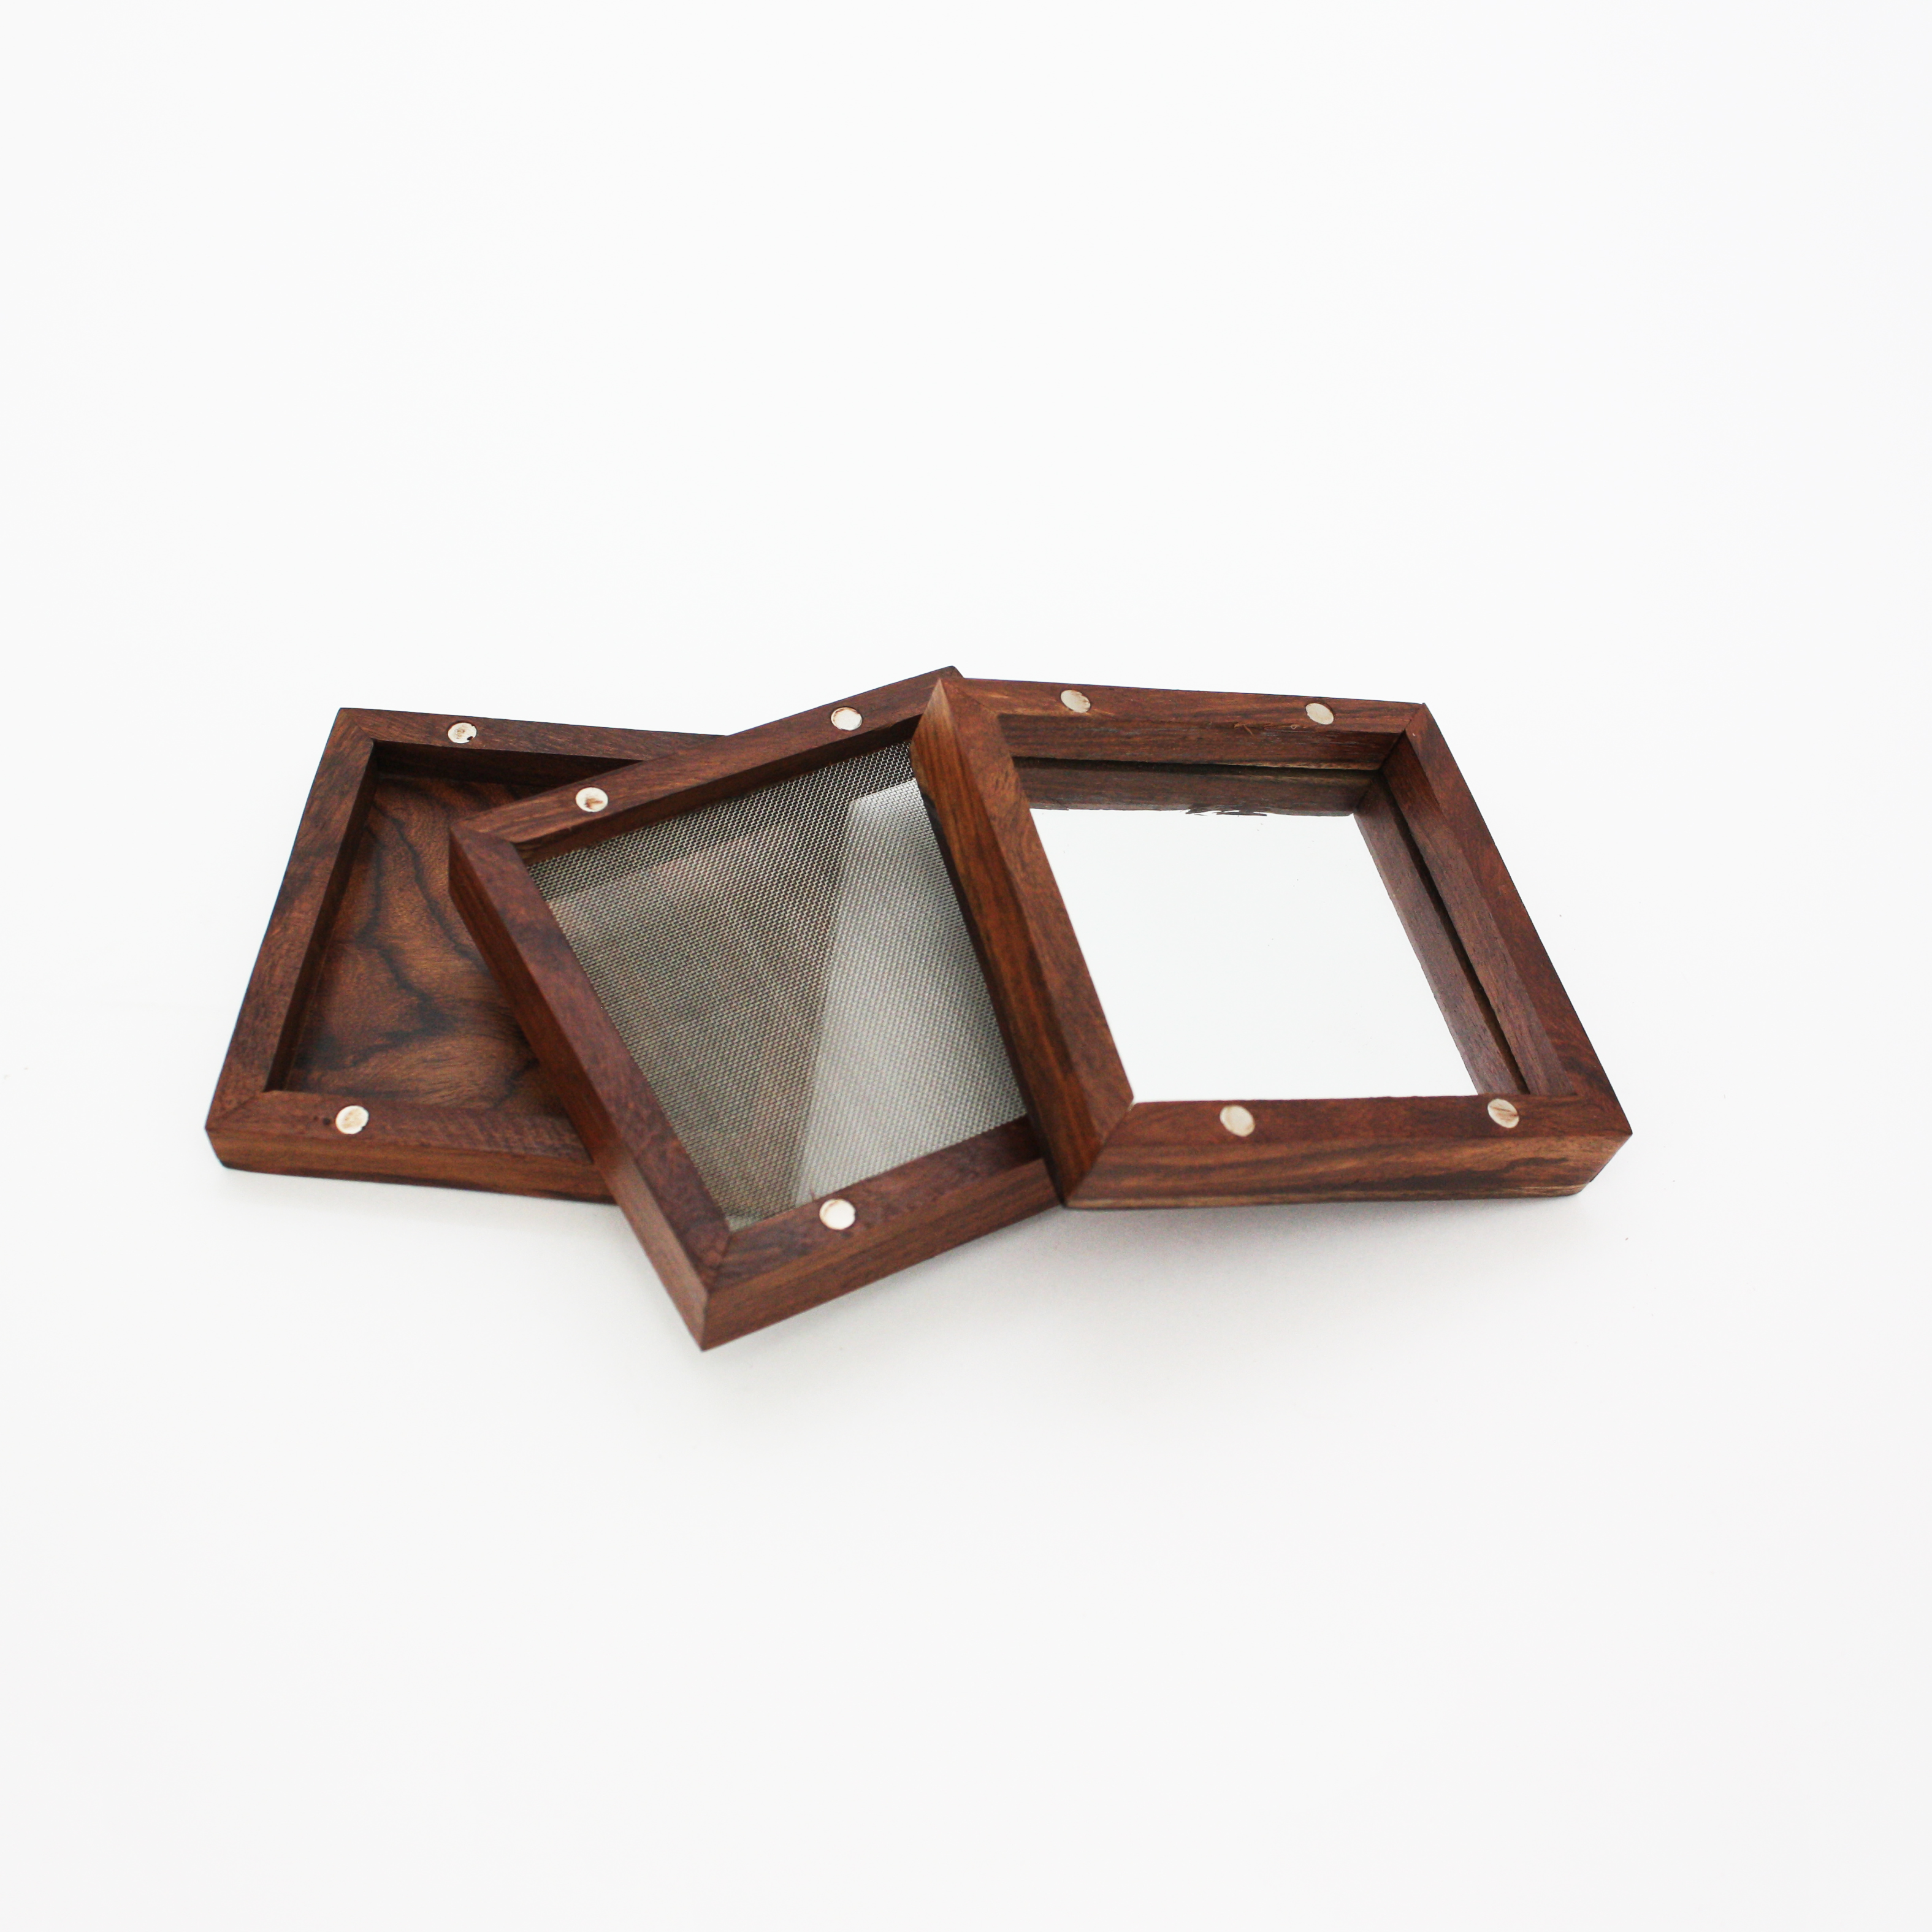 Wooden Pollen Sifter Kief Box With Mirror 44